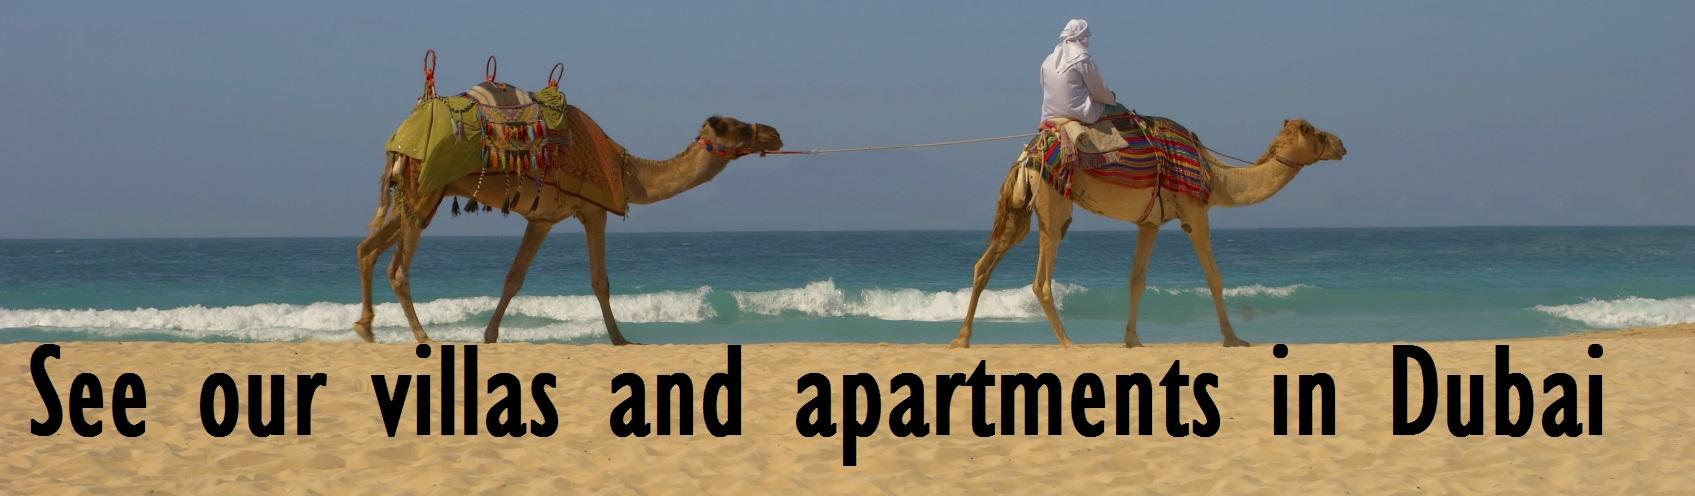 villas and apartments in Dubai